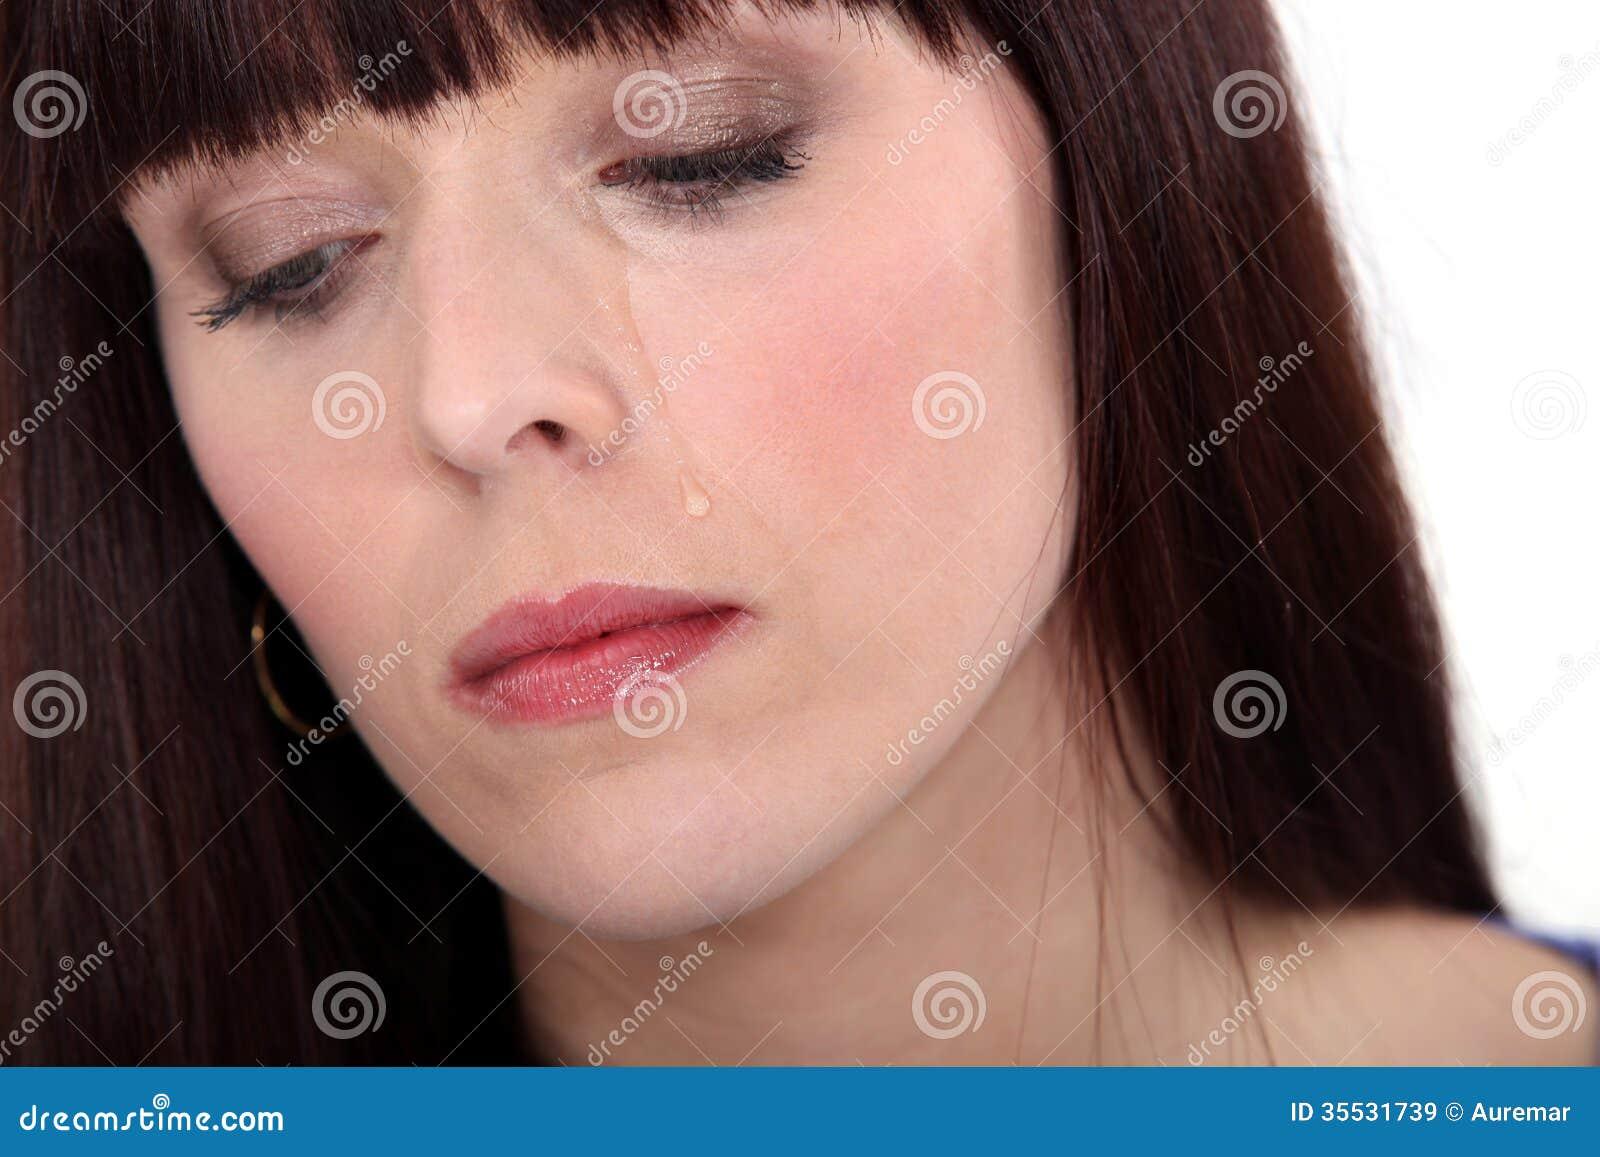 Upset Woman Crying Royalty Free Stock Images Image 35531739